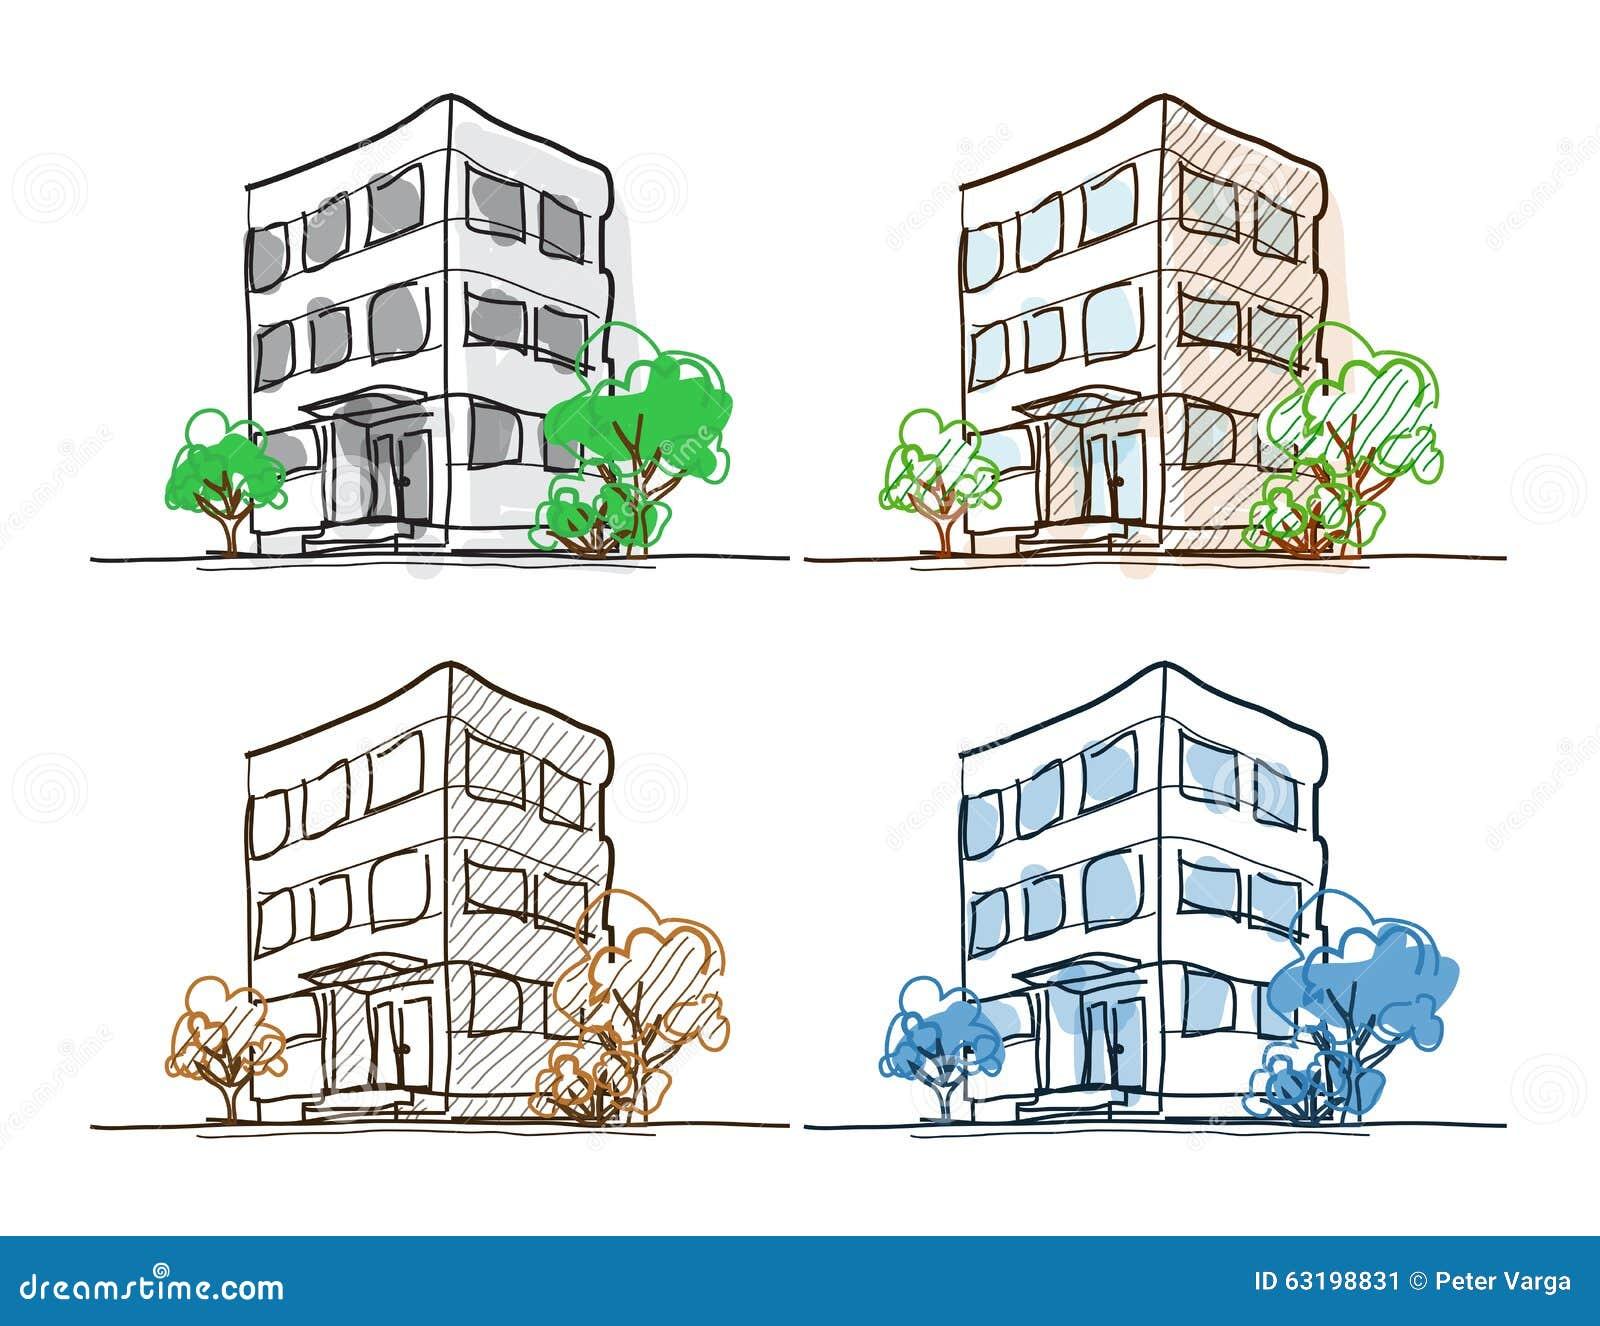 Cartoon Drawing Outline Vector Buildings Doodle